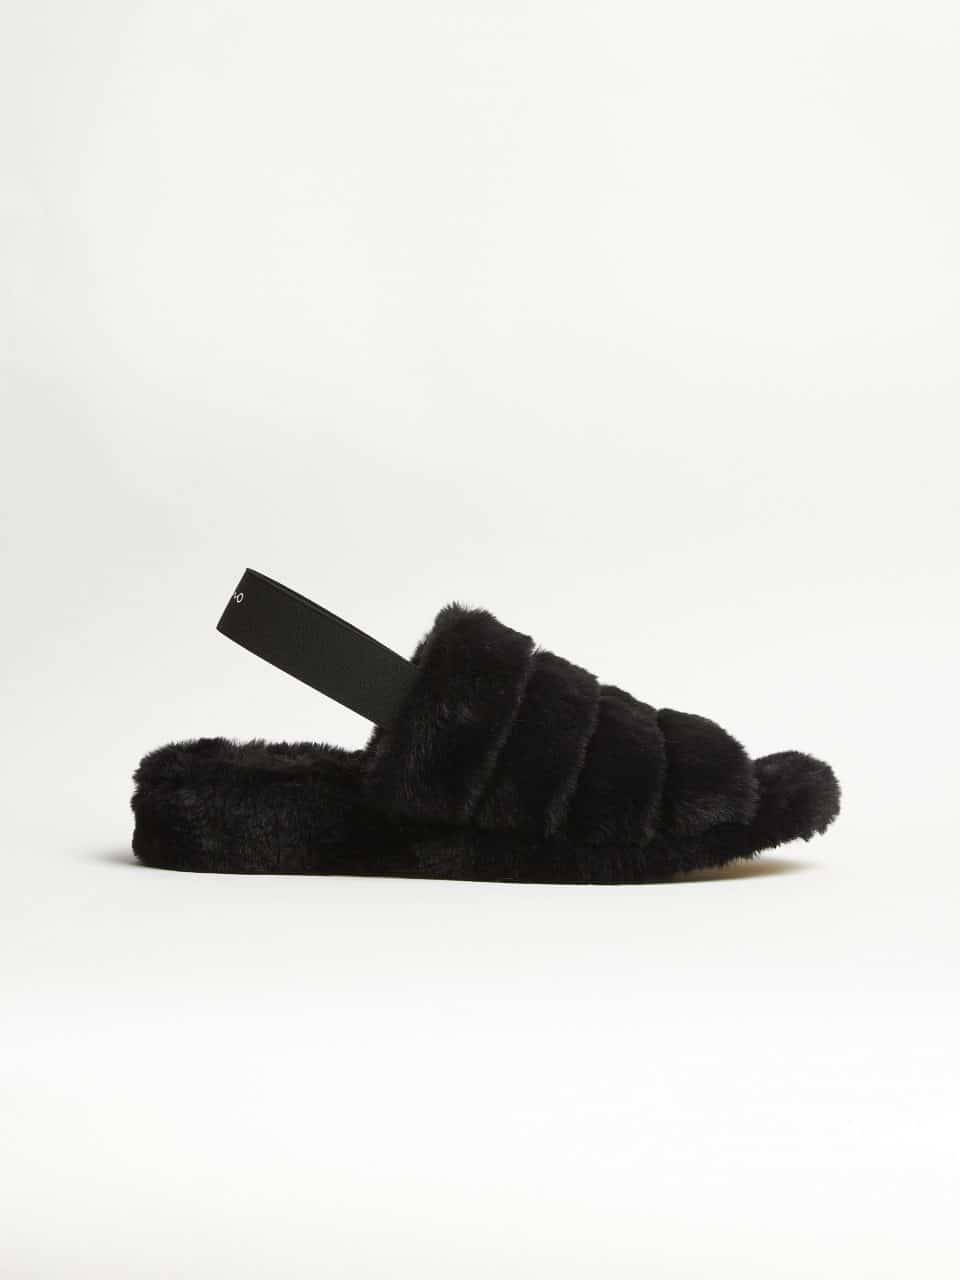 Max Pelo Negro Slippers en Loyna Shoes